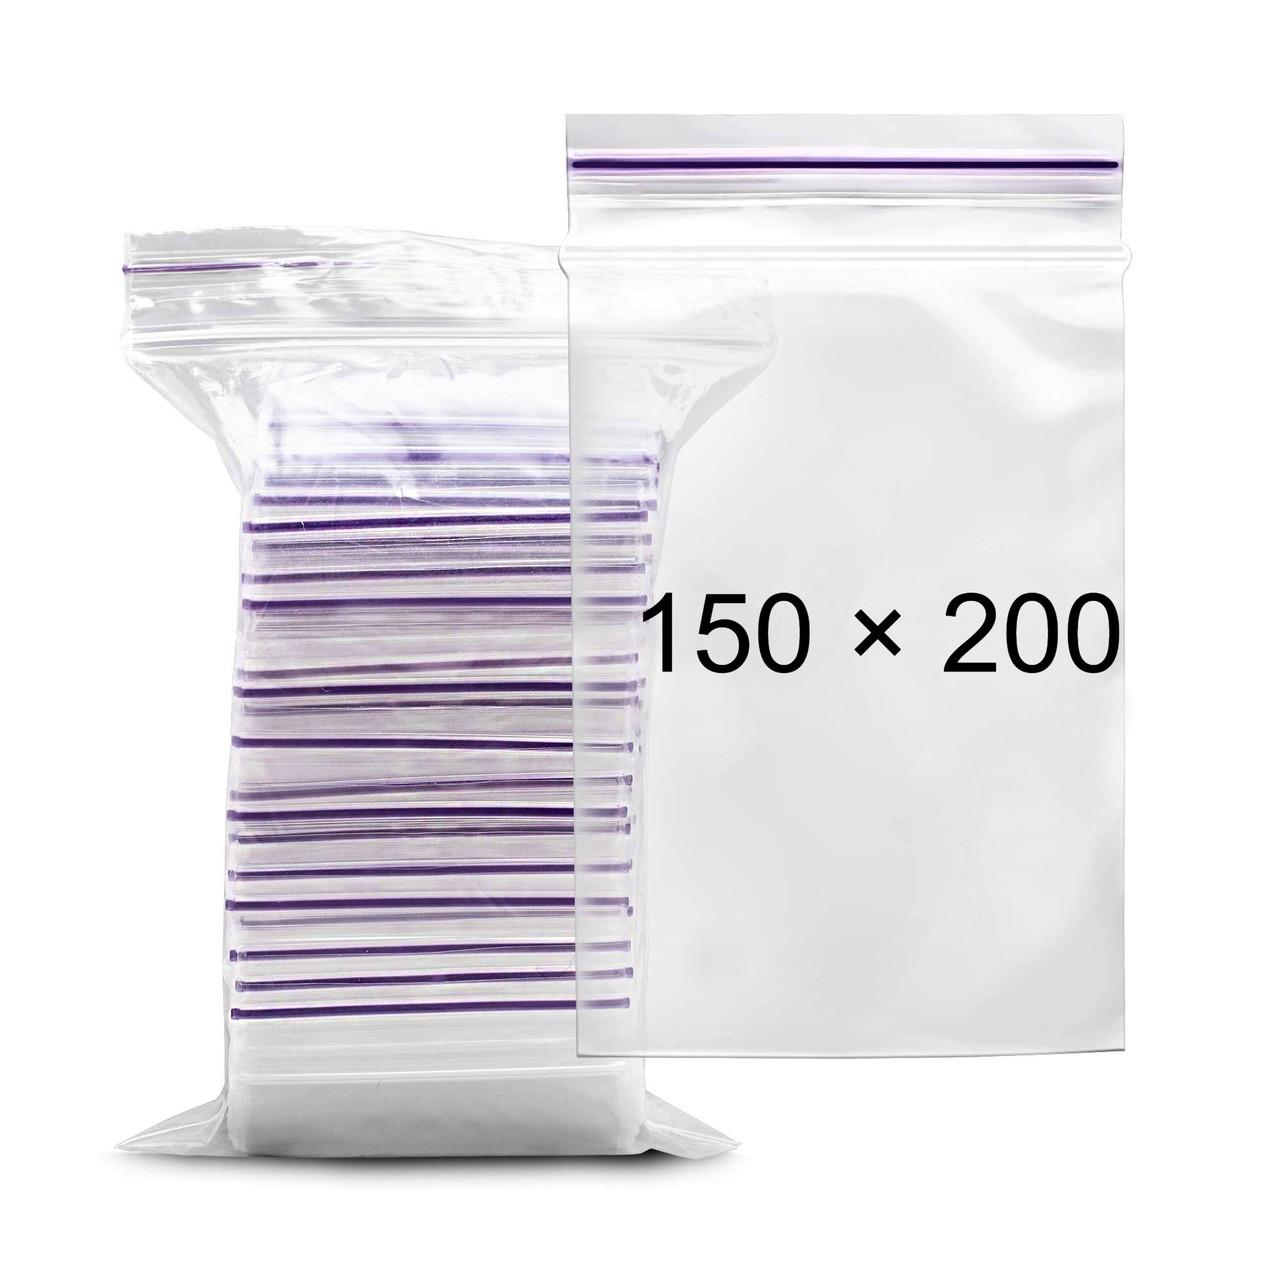 Пакеты с замком Zip-Lock - 150 × 200